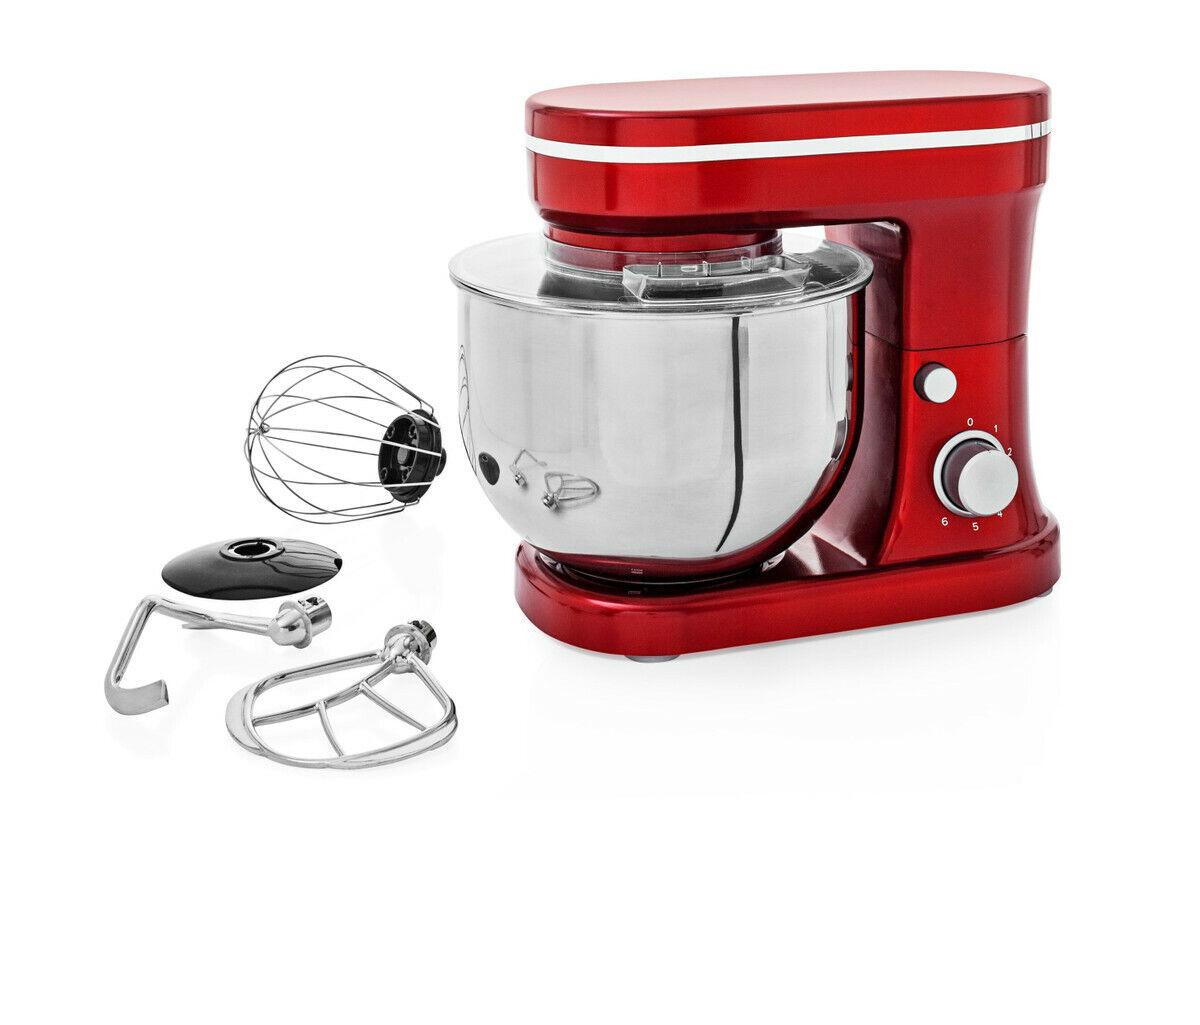 Küchenmaschine Retro-Look 4,2Liter Edelstahl-Rührschüssel metallic-rot 1200 Watt